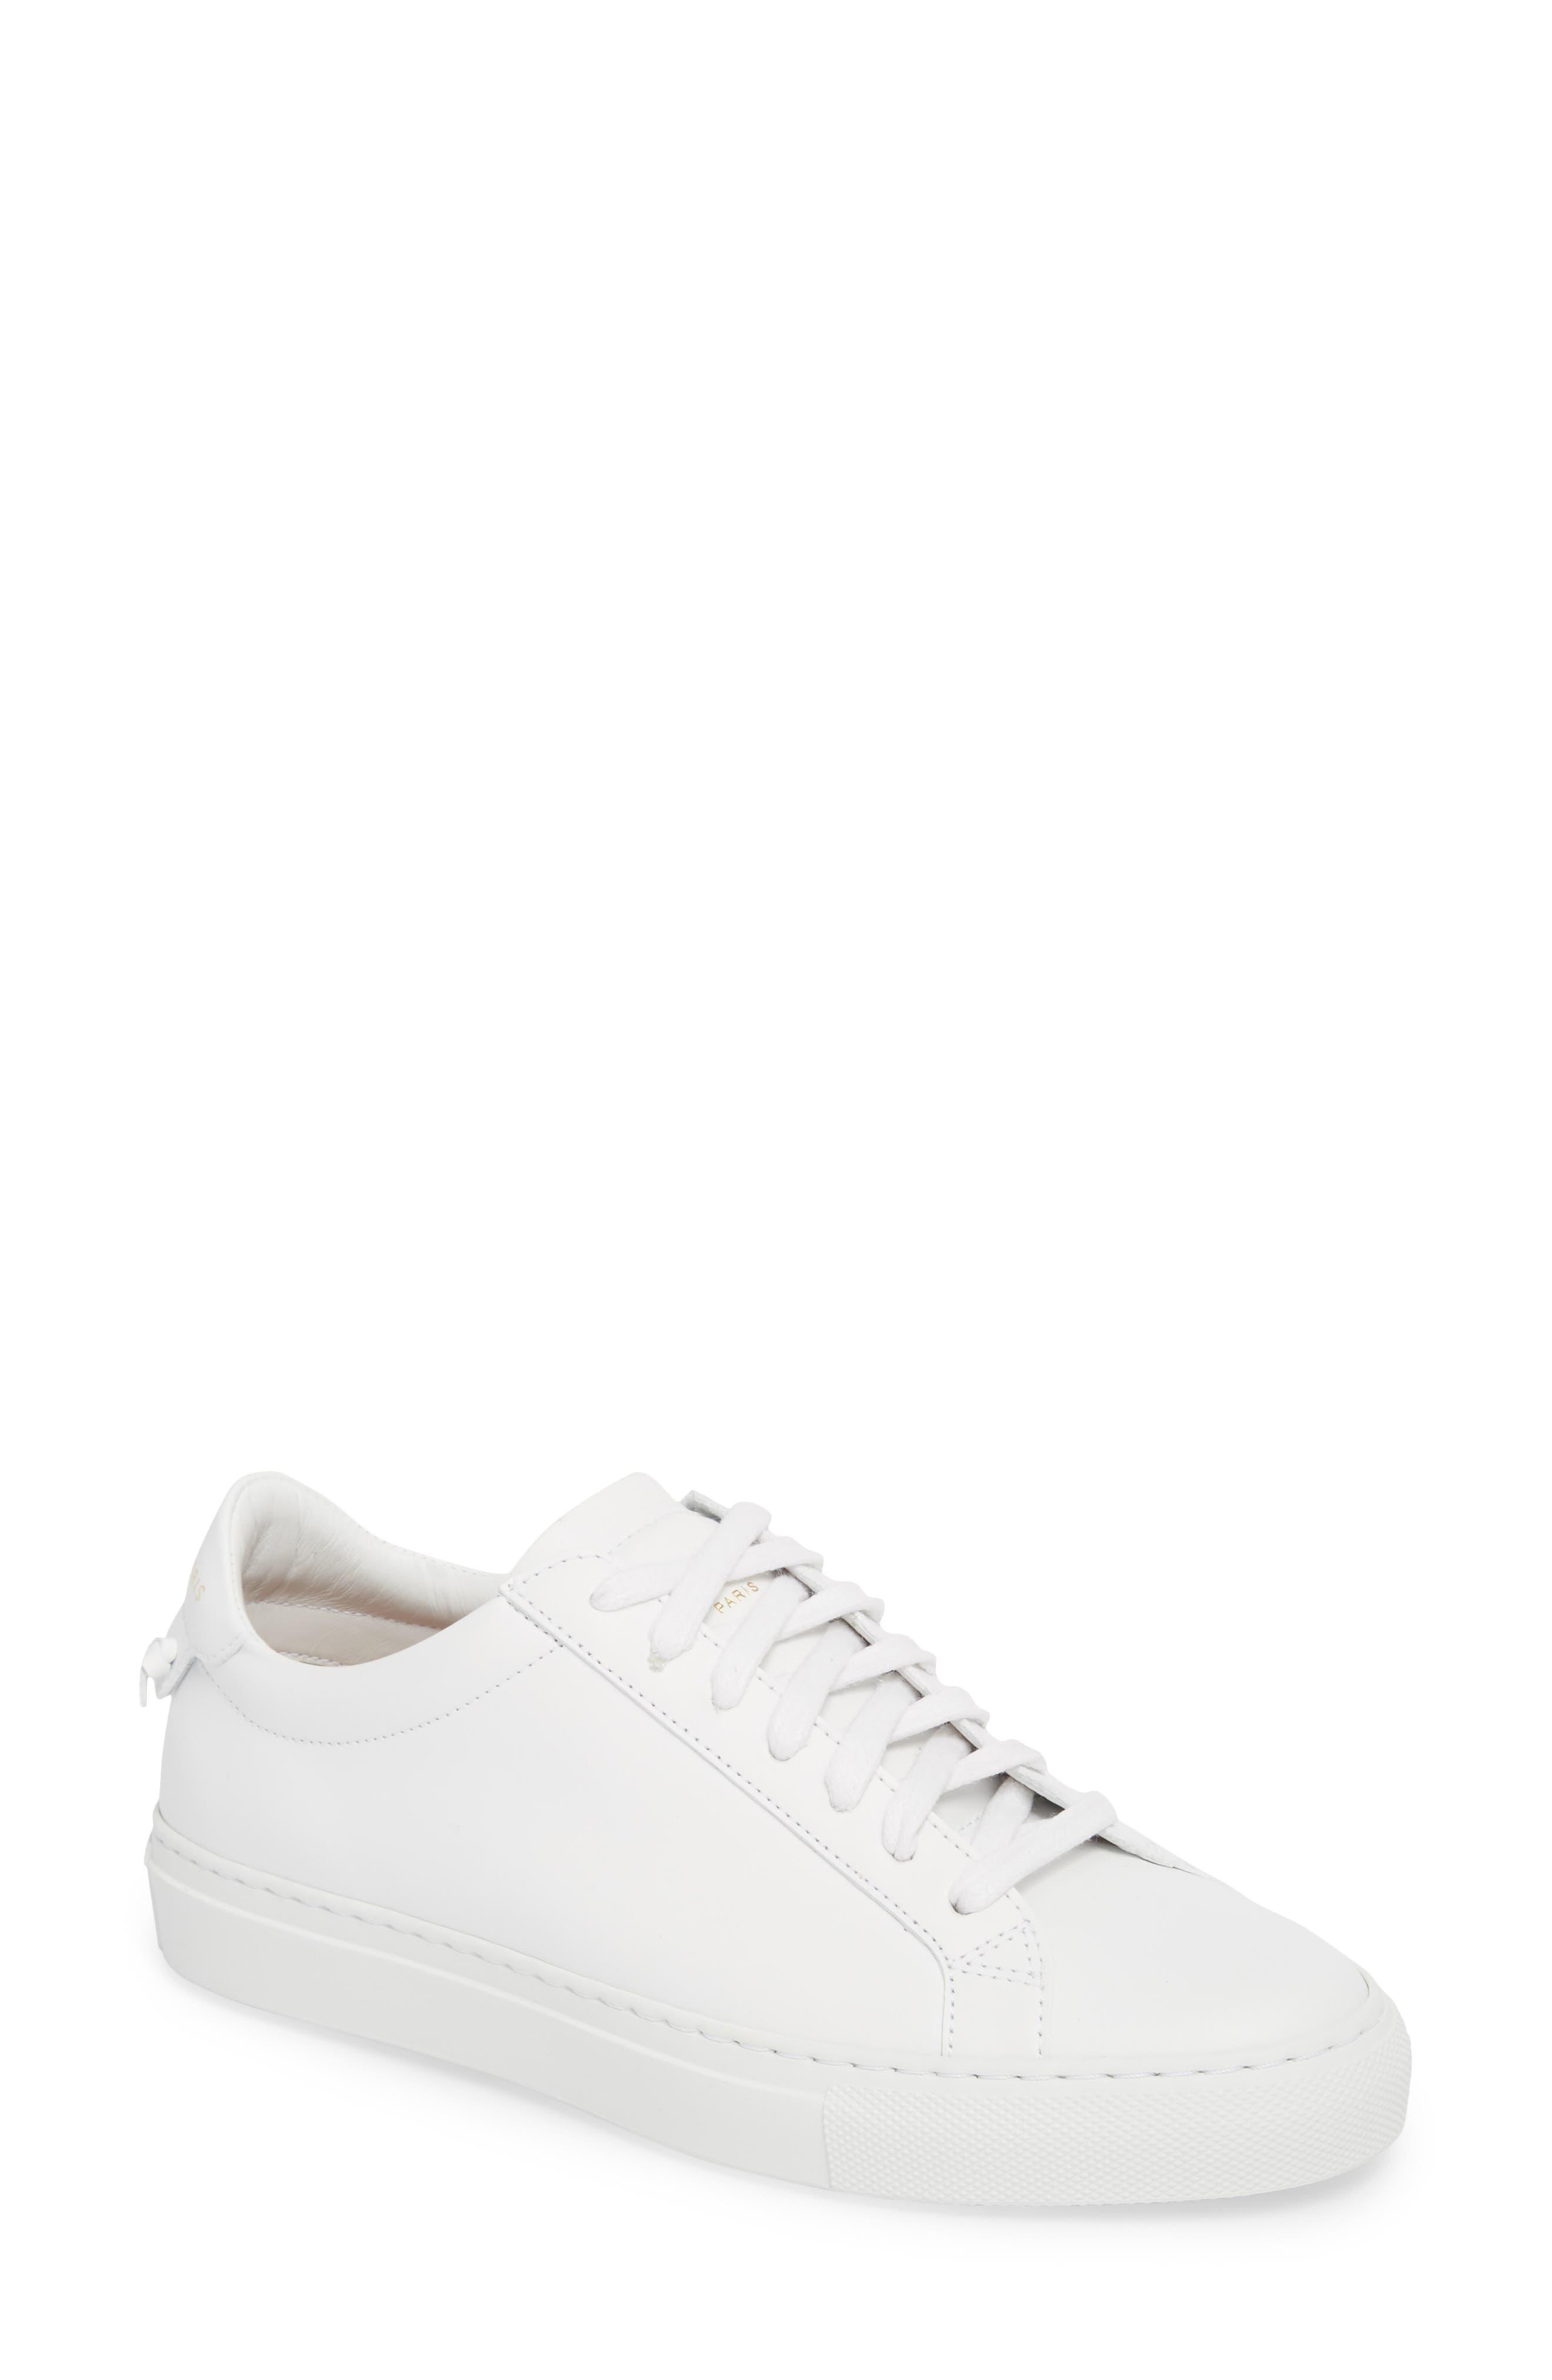 Low Top Sneaker,                             Main thumbnail 1, color,                             OPTIC WHITE